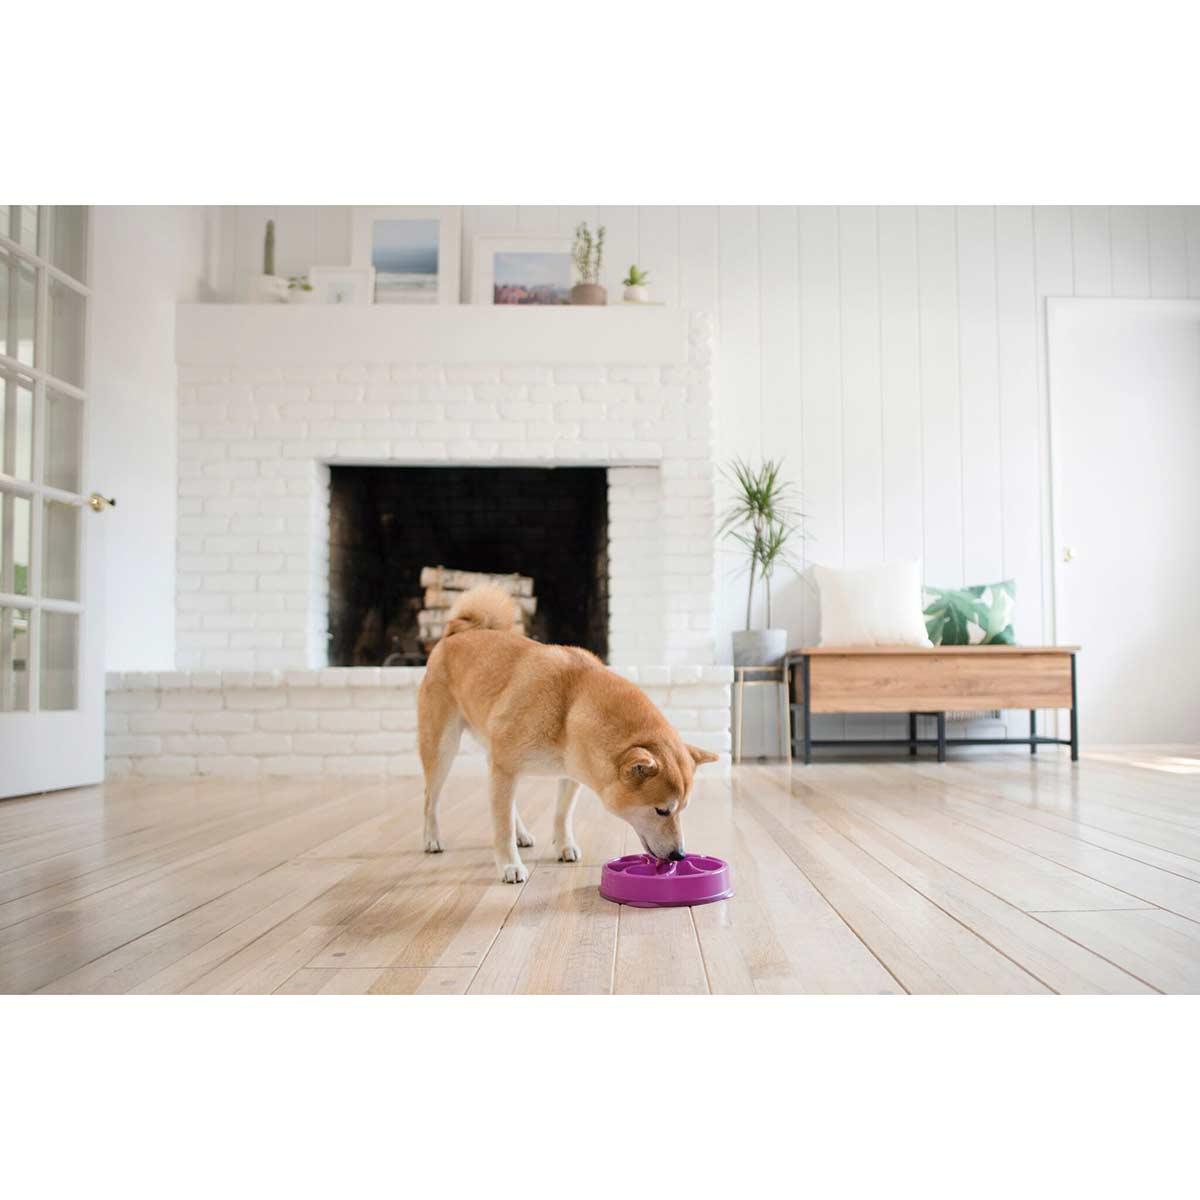 Dog eating out of Outward Hound Slo-Bowl Flower Regular 12 inch